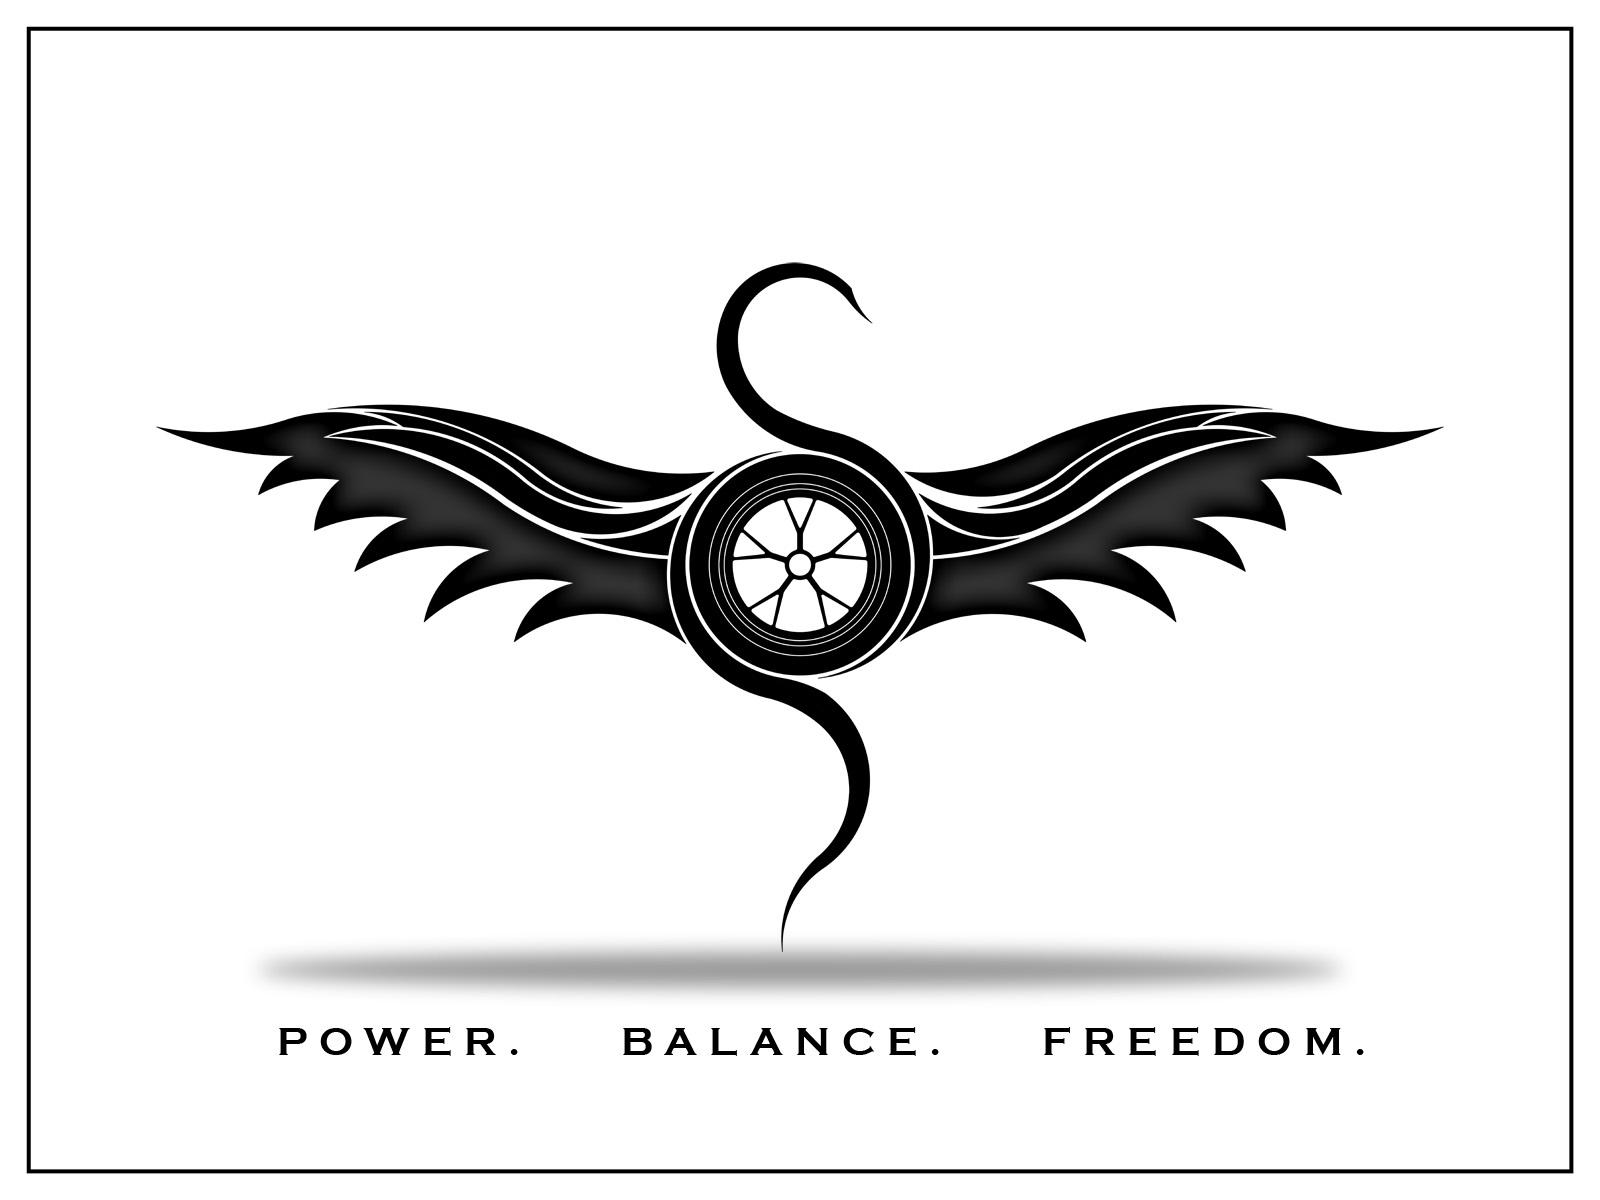 powerbalancefreedombyohfive30 speaking truth to